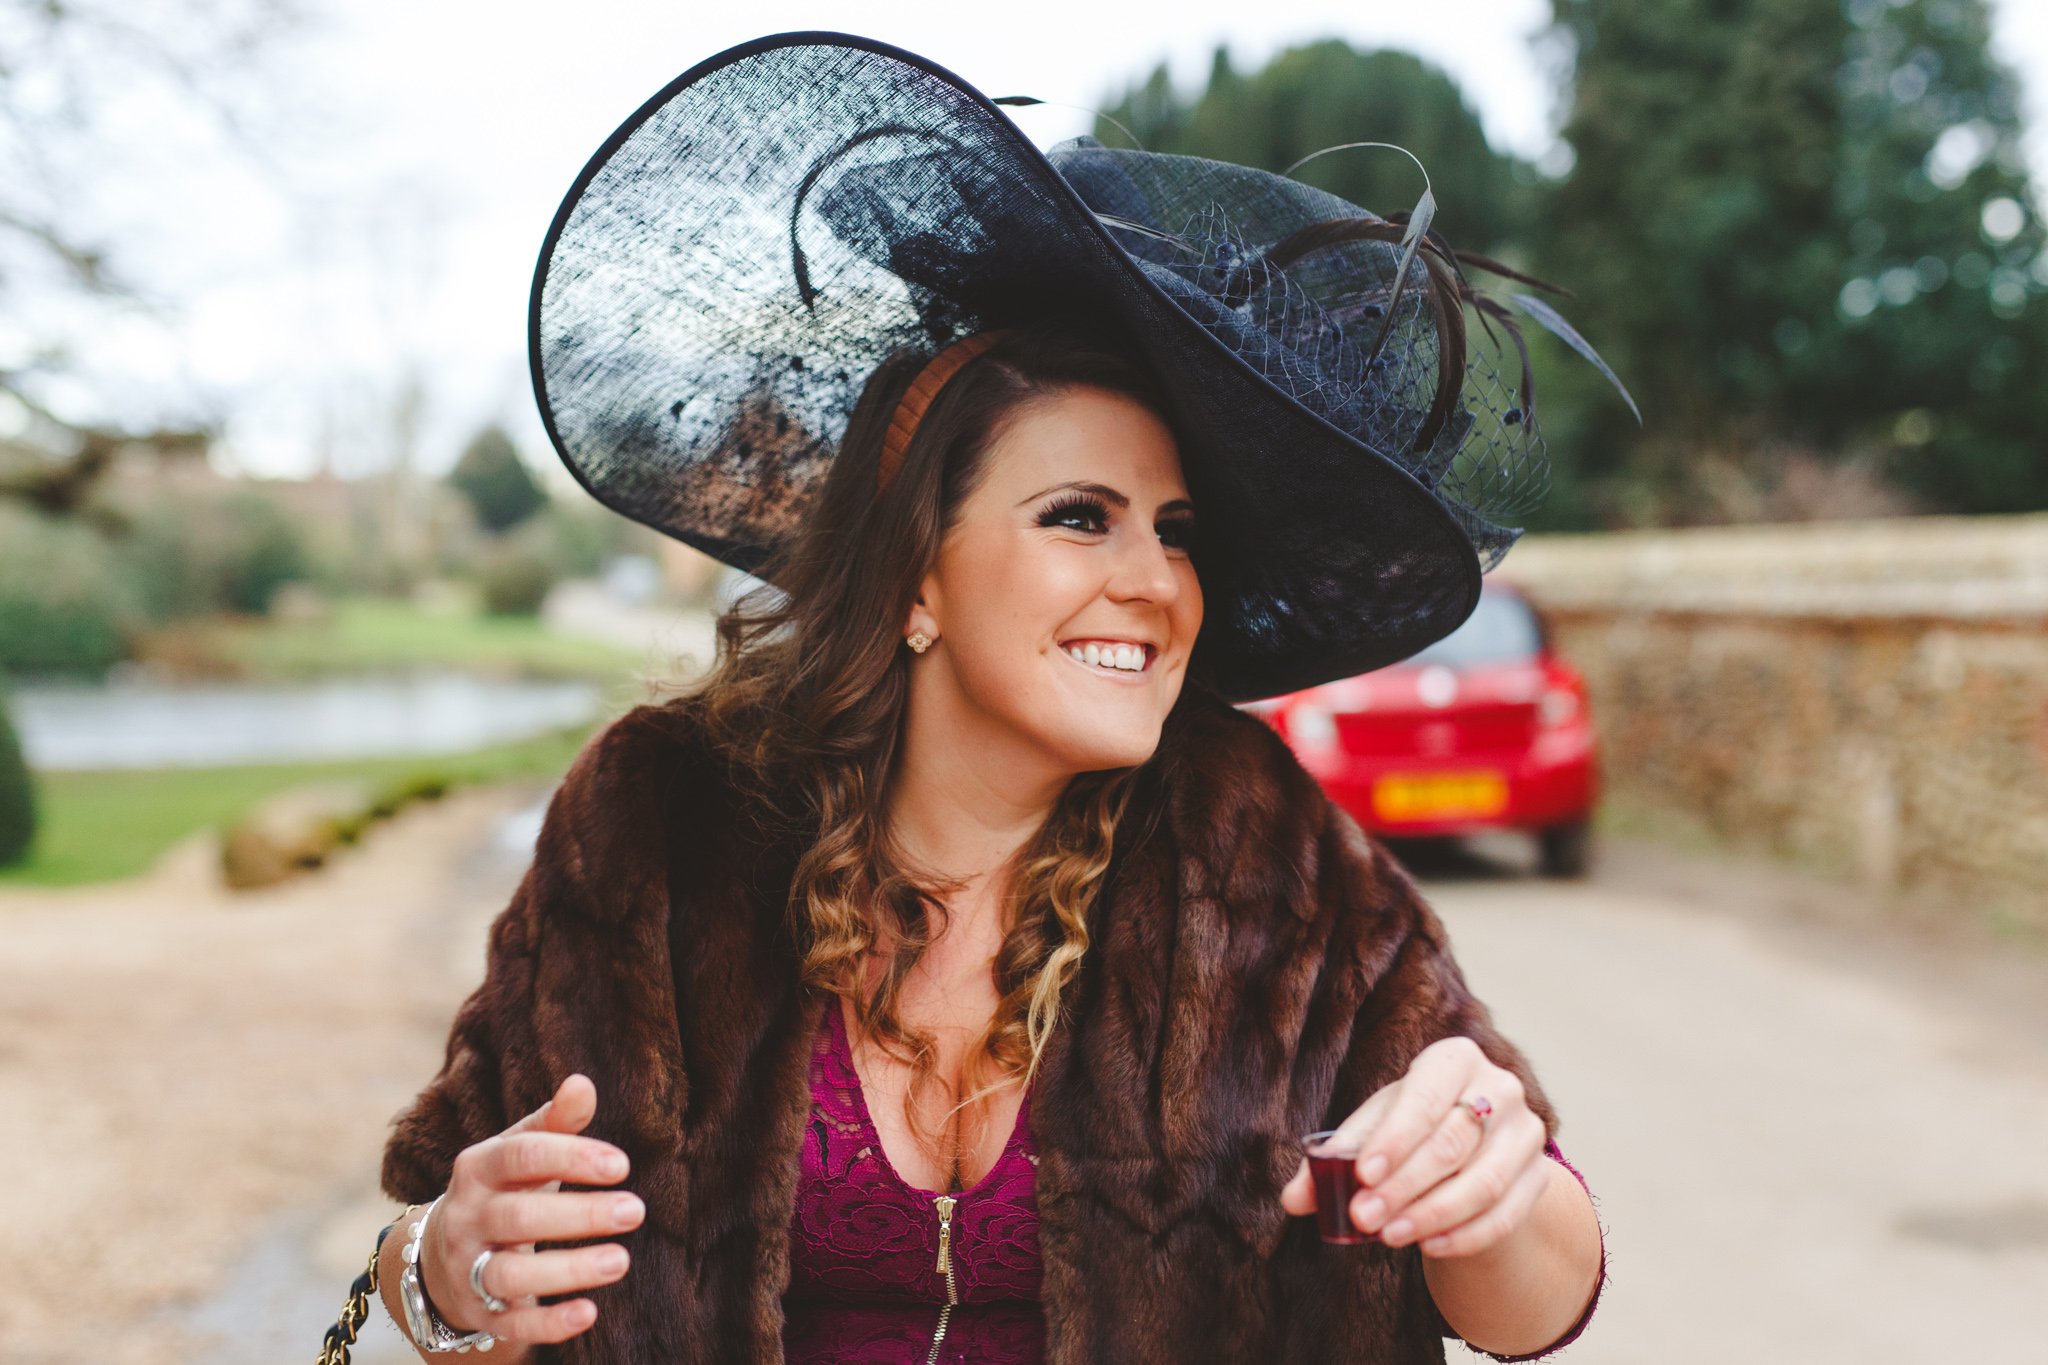 derbyshire-wedding-photographer-camera-hannah-4.jpg